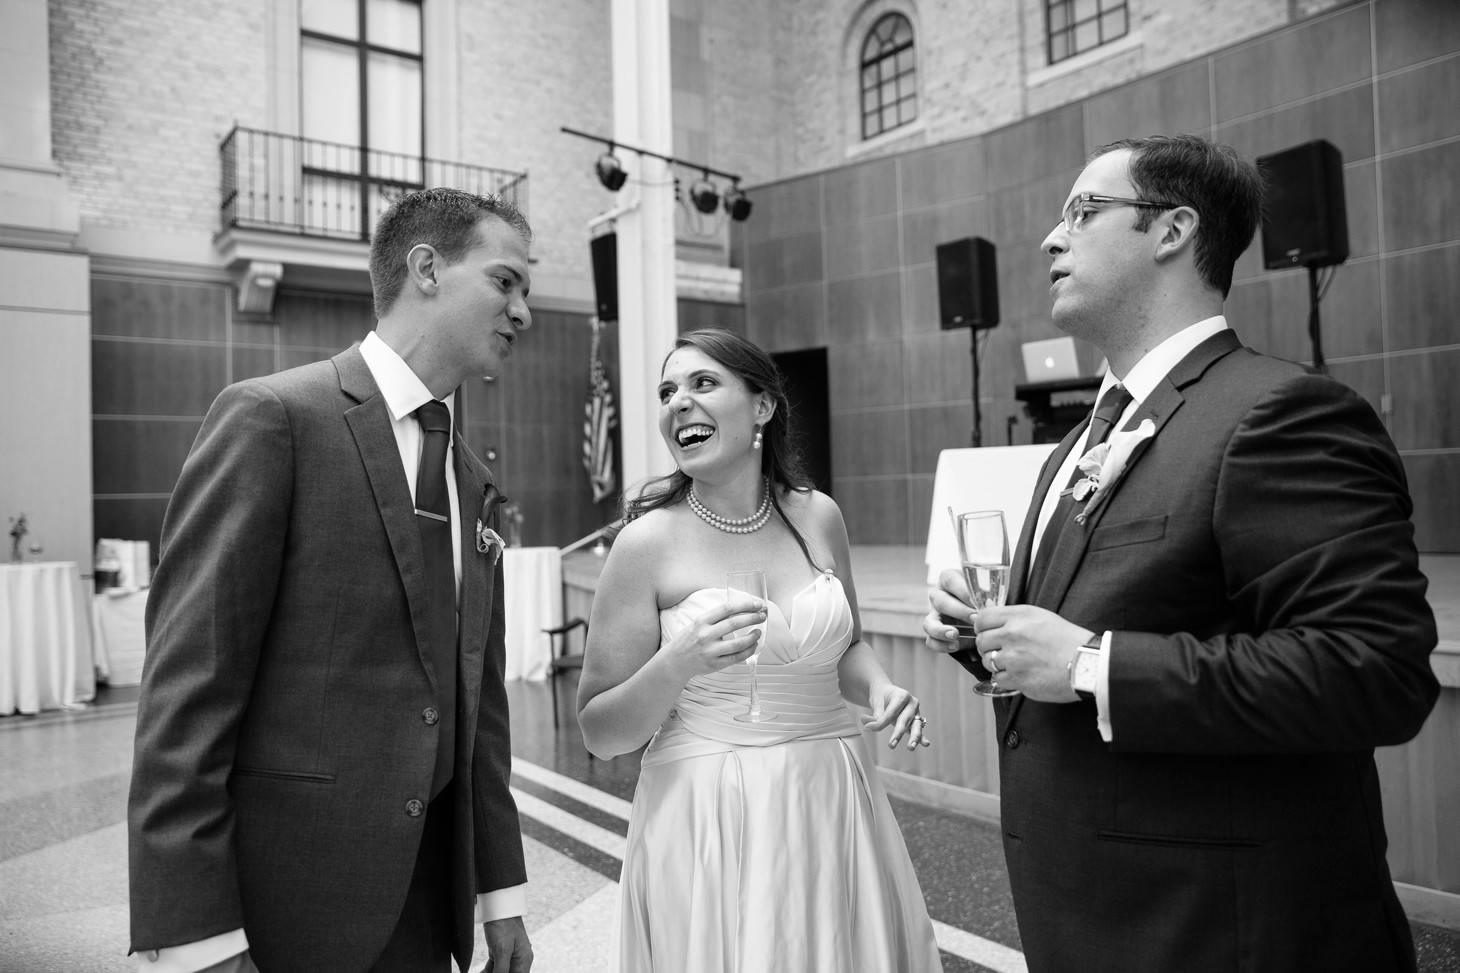 079-nyc-wedding-photographer-hoboken-waterfront-wedding-photos-smitten-chickens.jpg